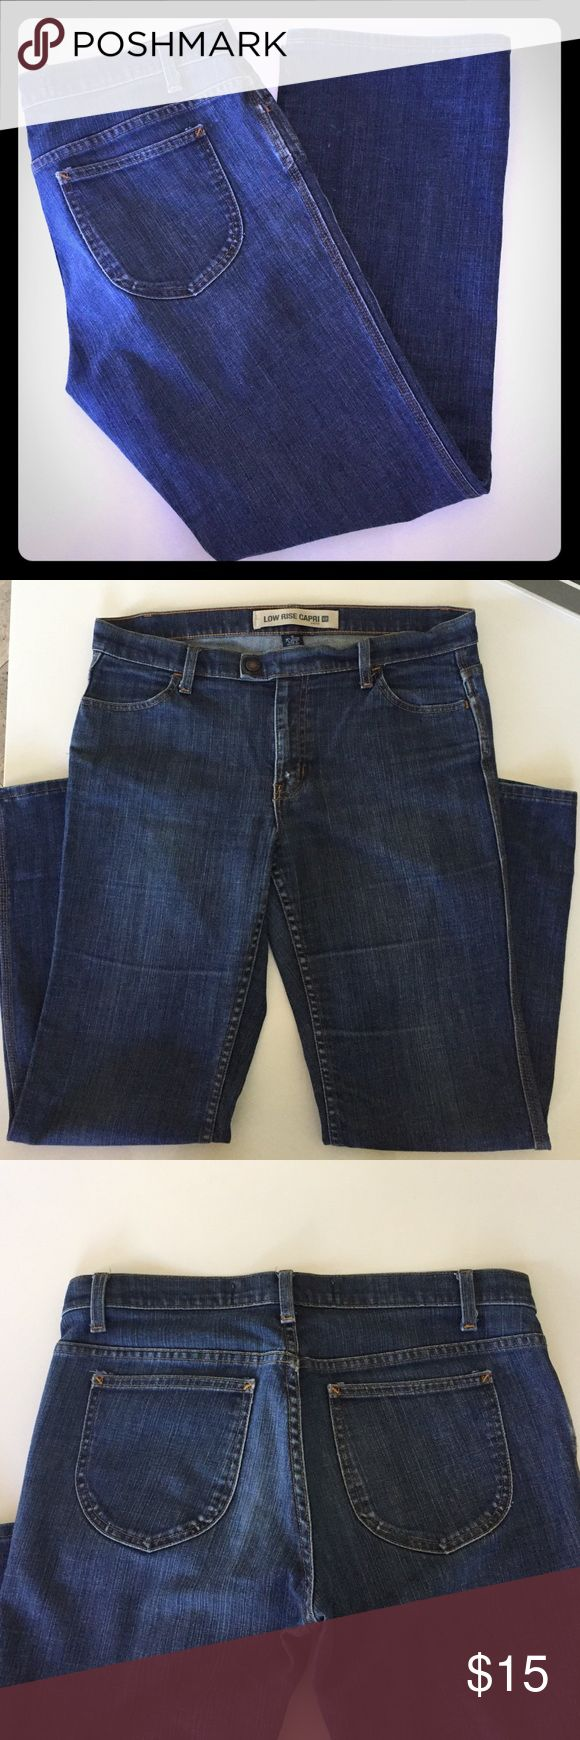 "GAP Low Rise Capri Jean Gap Low Rise Jean has zipper and clasp button closure. 4 pockets 28"" inseam. GAP Jeans"